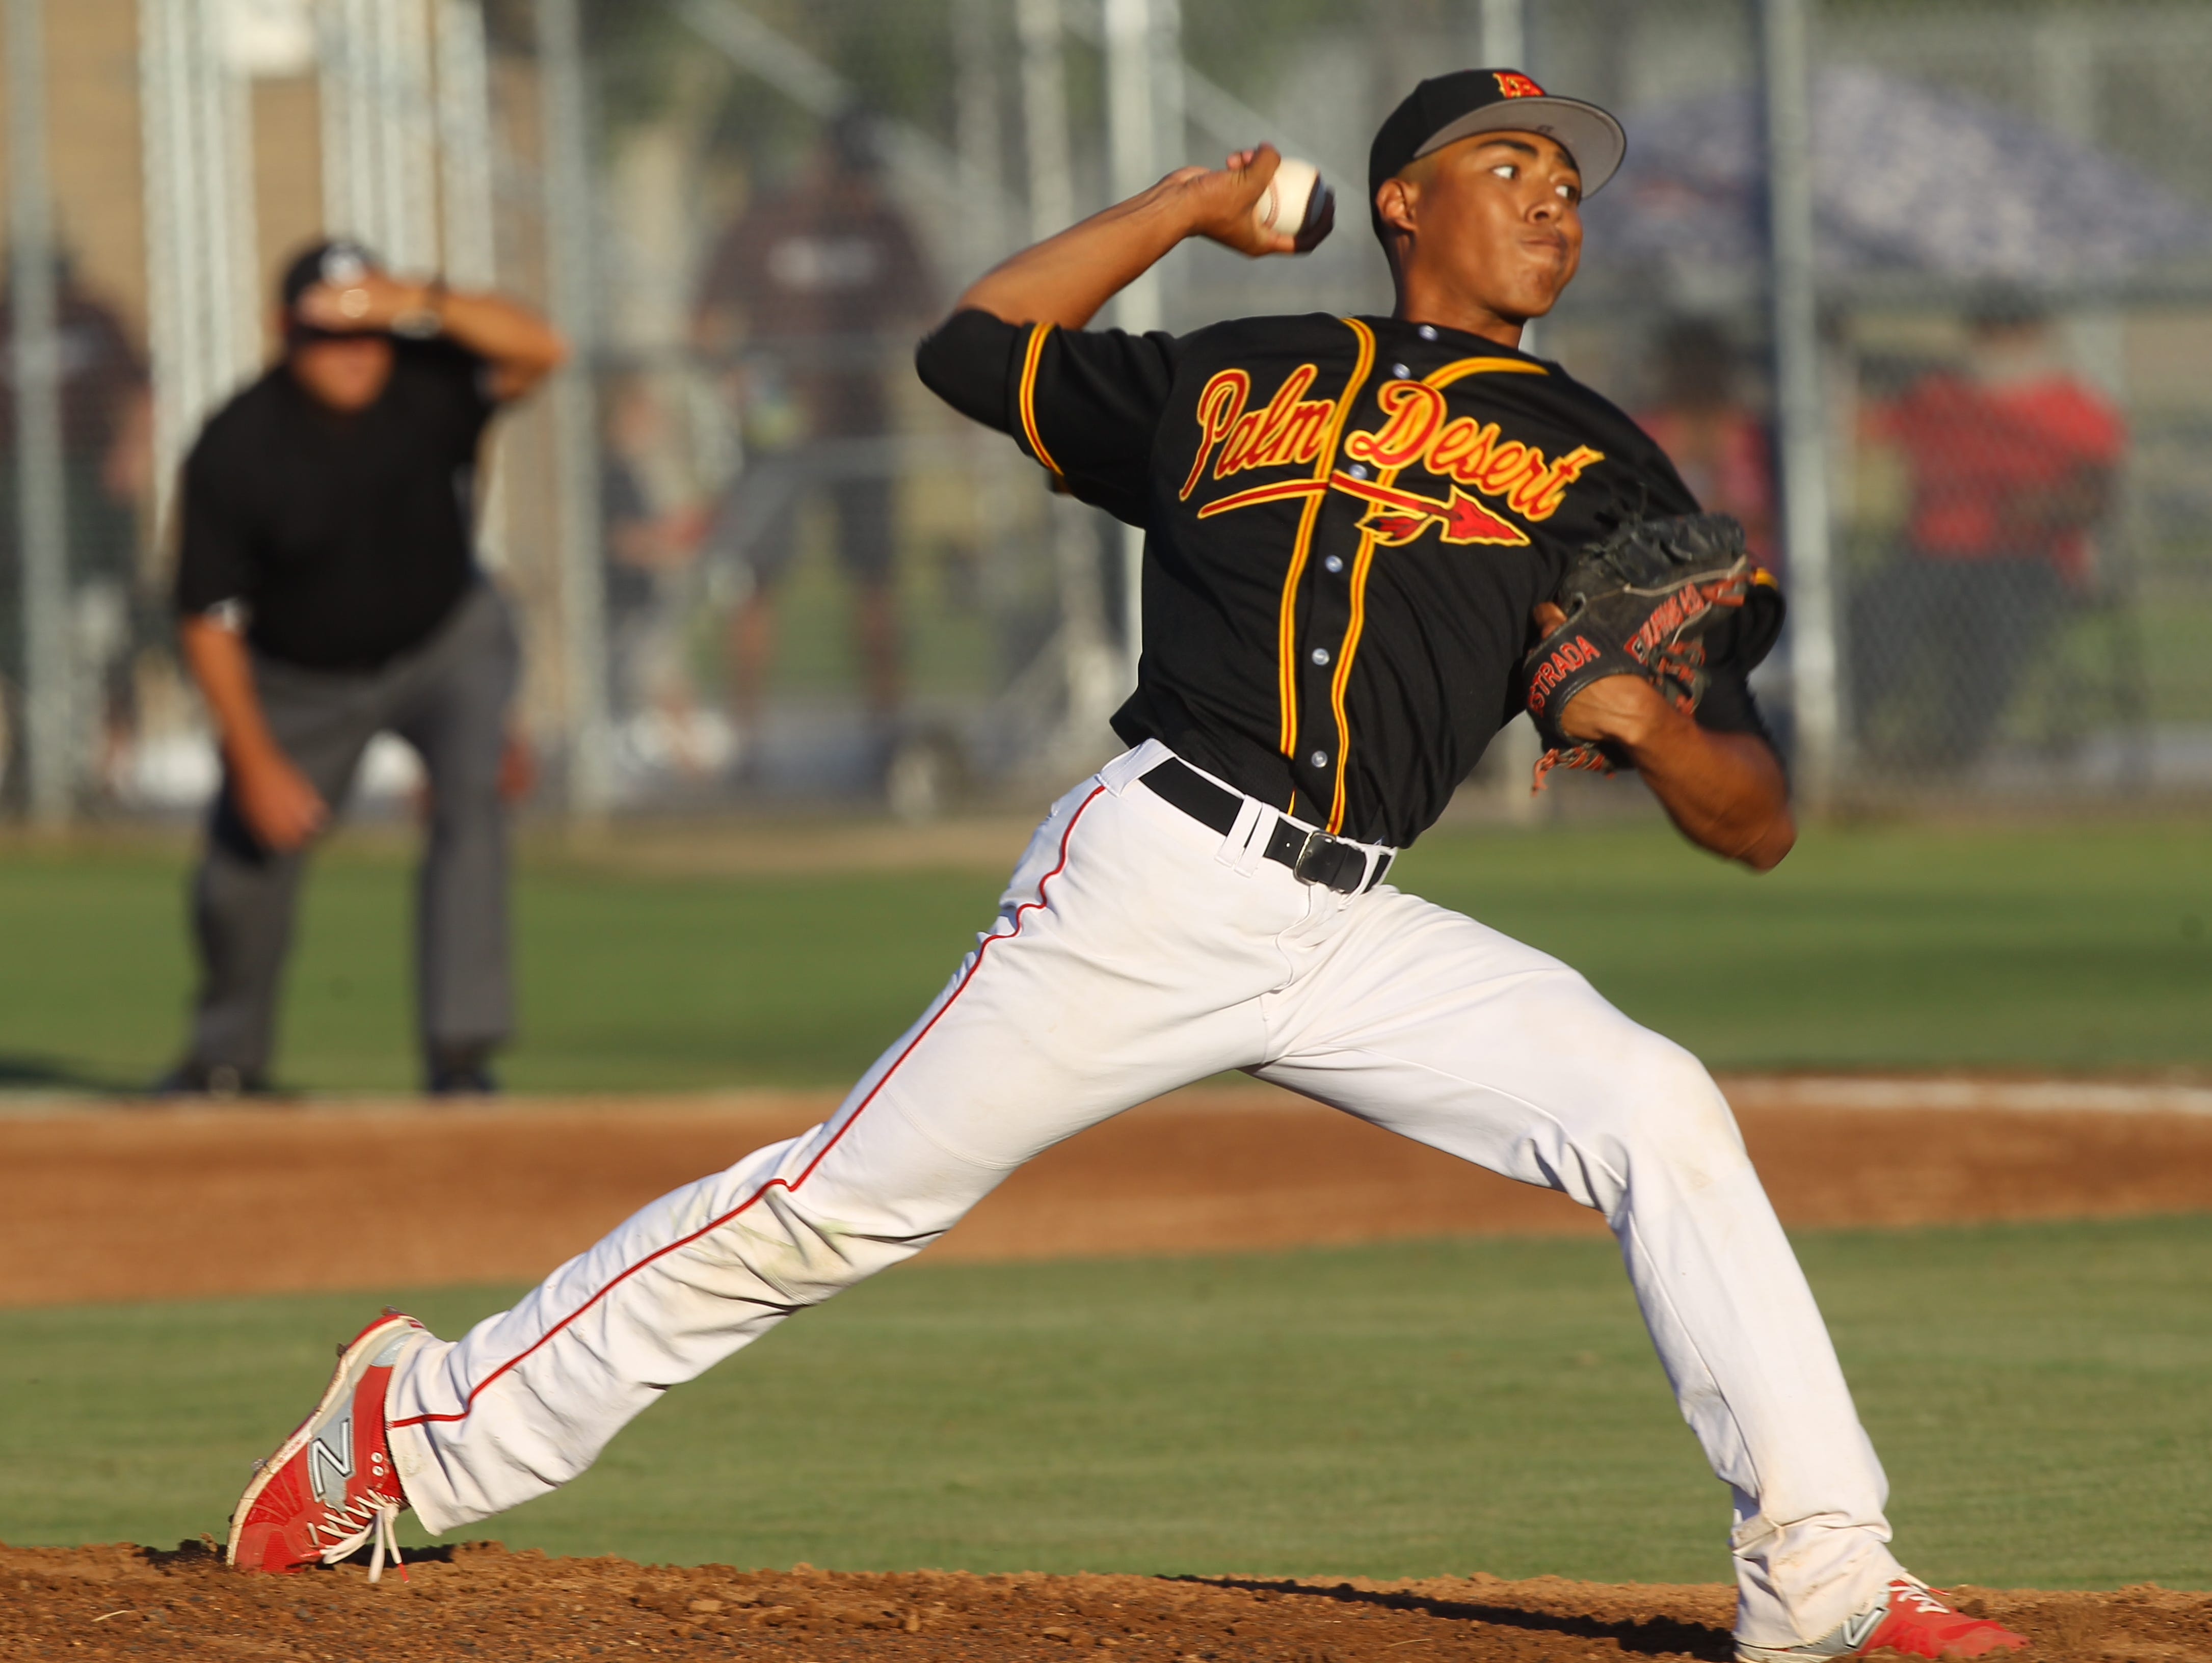 Palm Desert High School pitcher Jeremiah Estrada had a shutout against La Quinta High School at home on May 12, 2016.